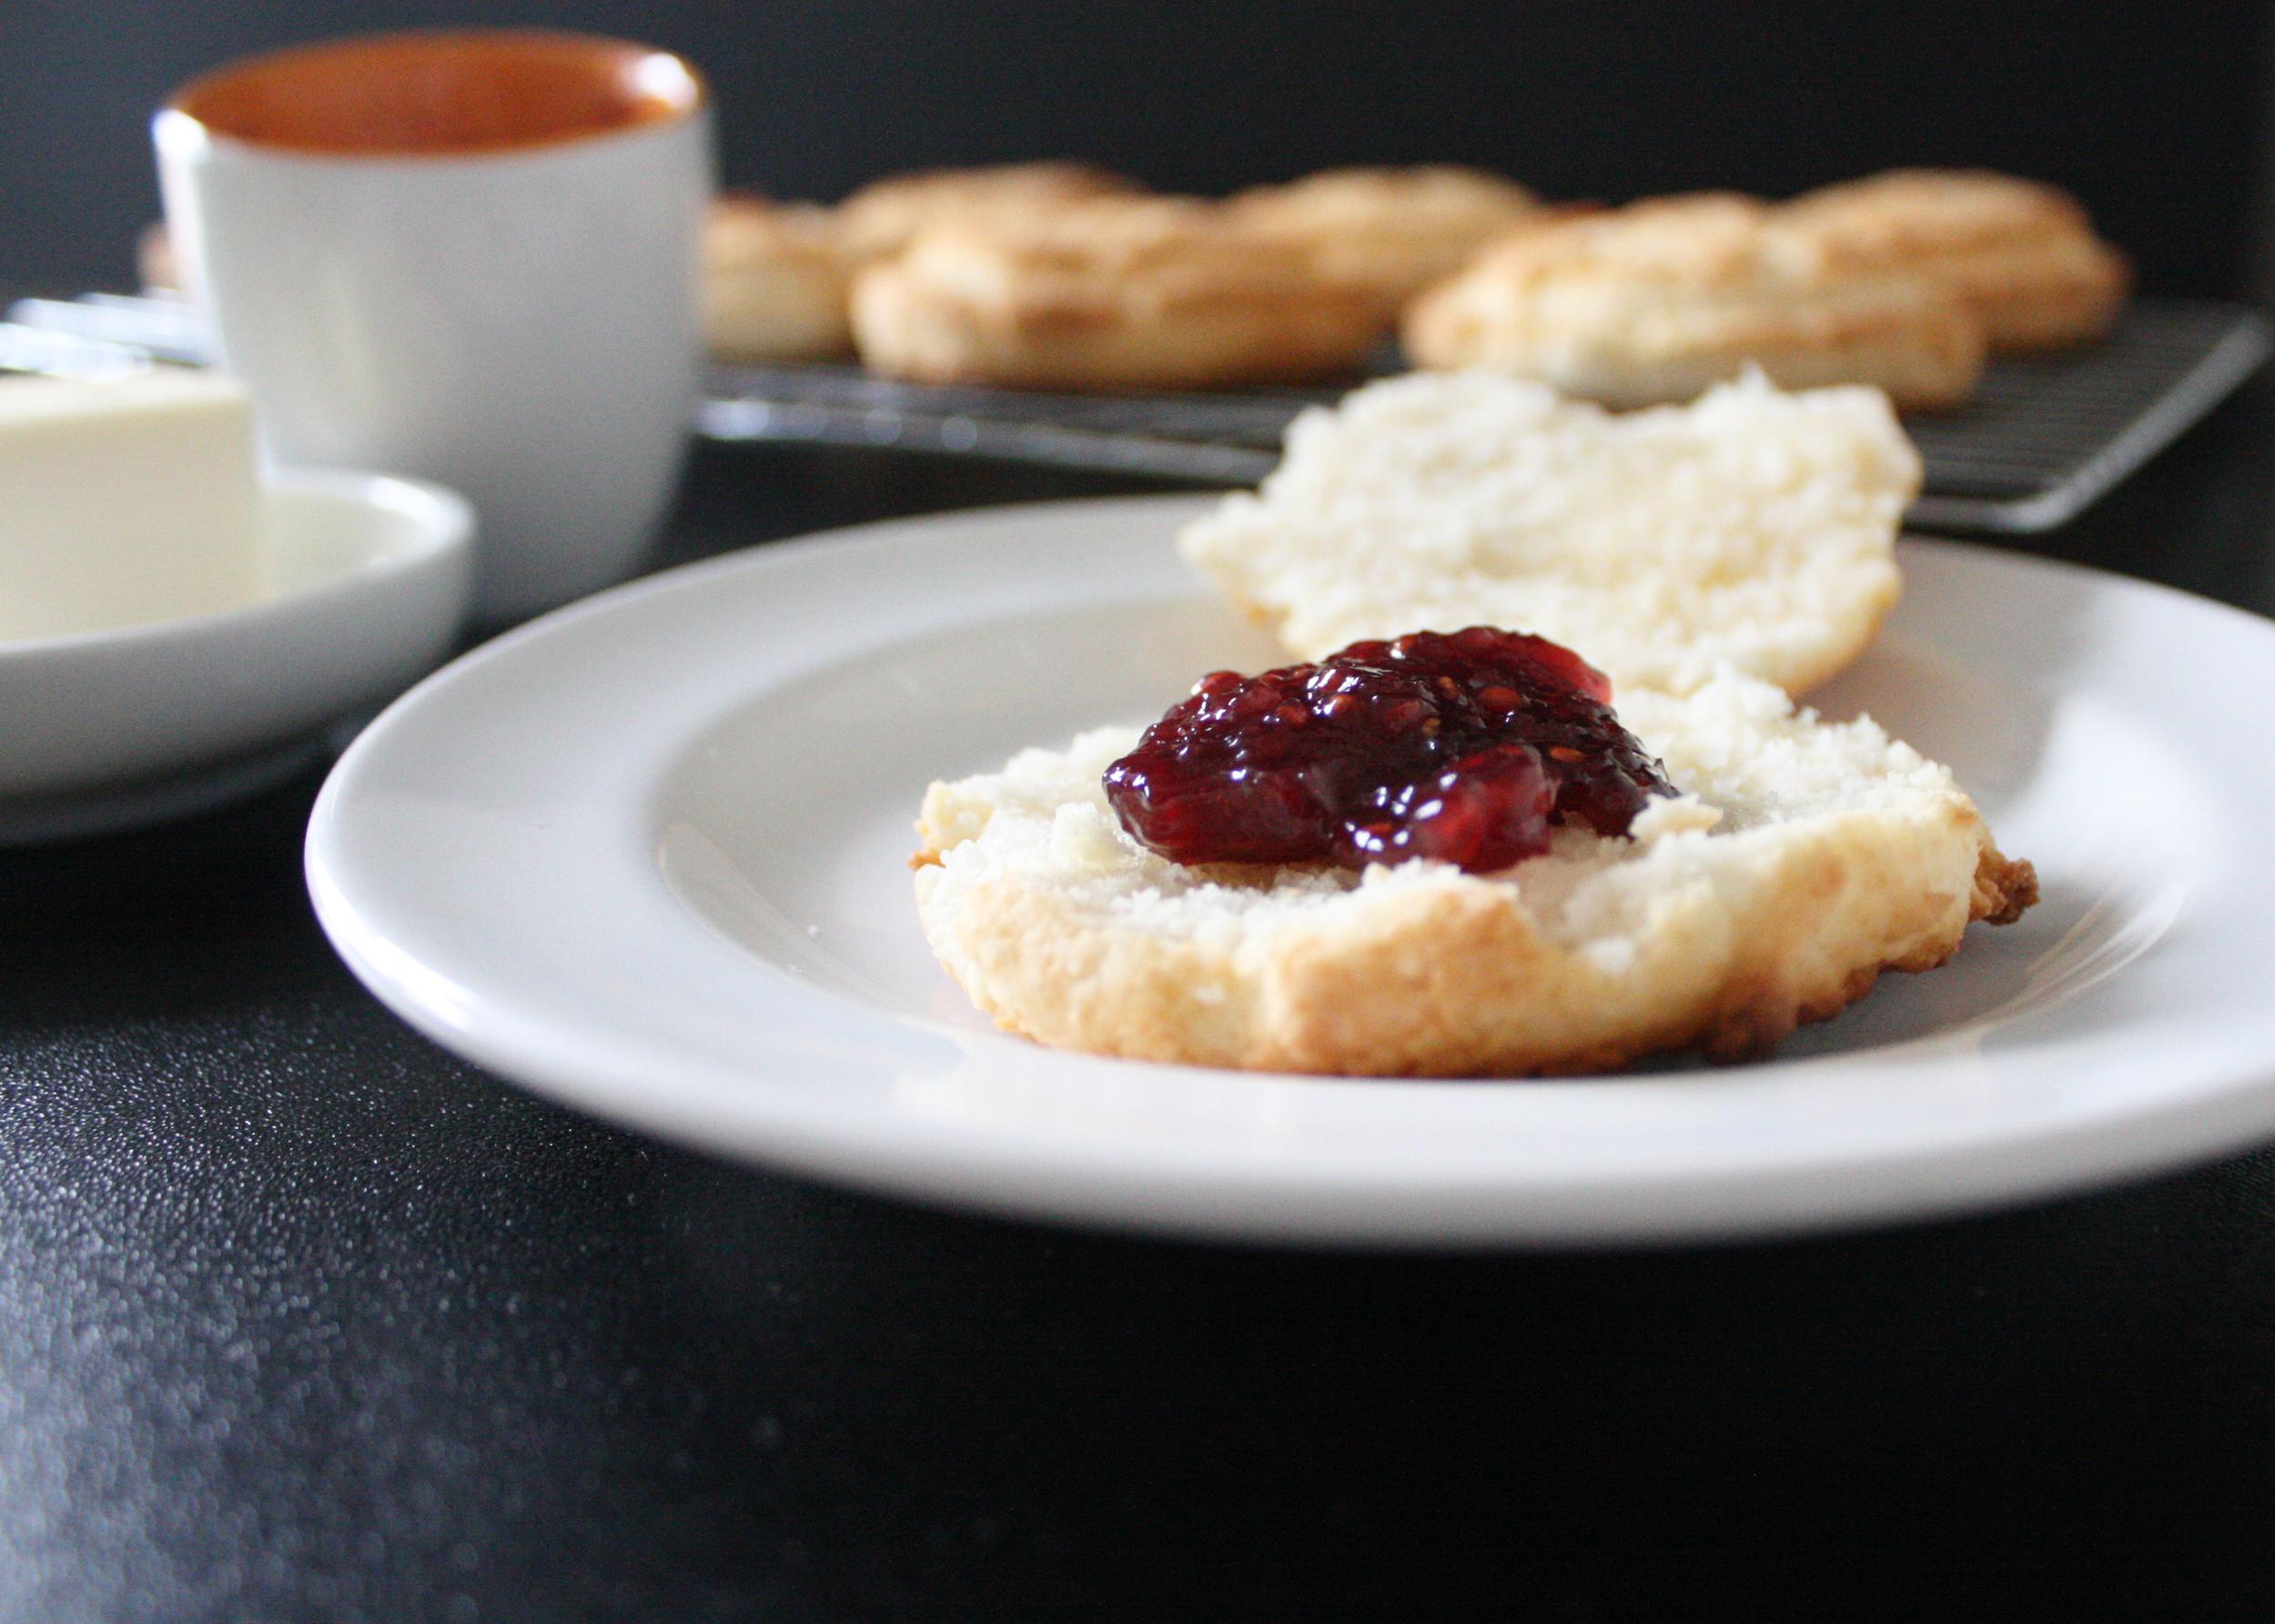 sam-c-perry-gluten-free-biscuits-jam-side.jpg